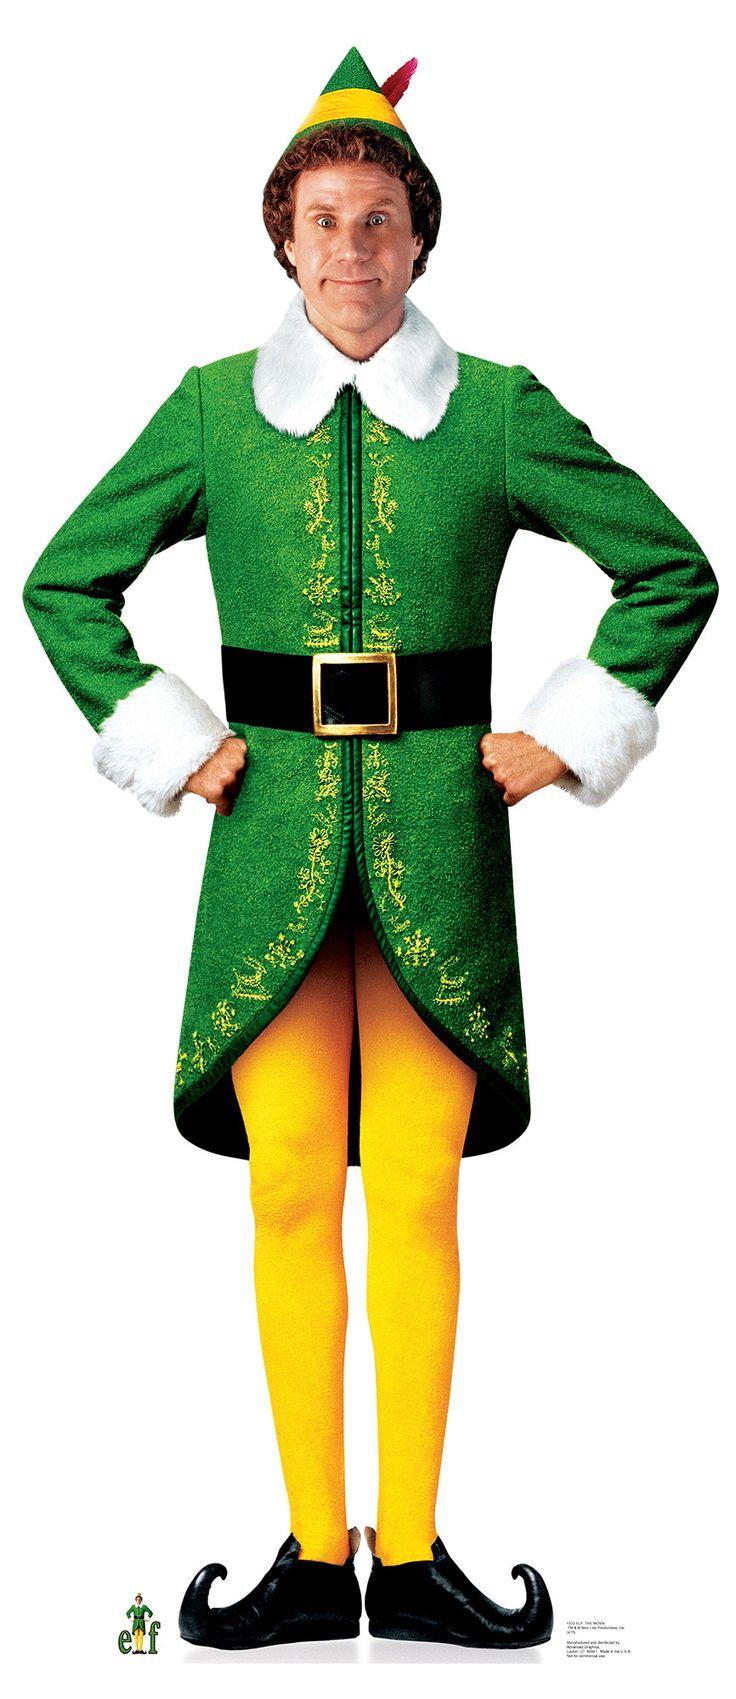 Advanced Graphics Elf Movie Elf Cardboard Stand Up Buddy The Elf Costume Elf Movie Buddy The Elf